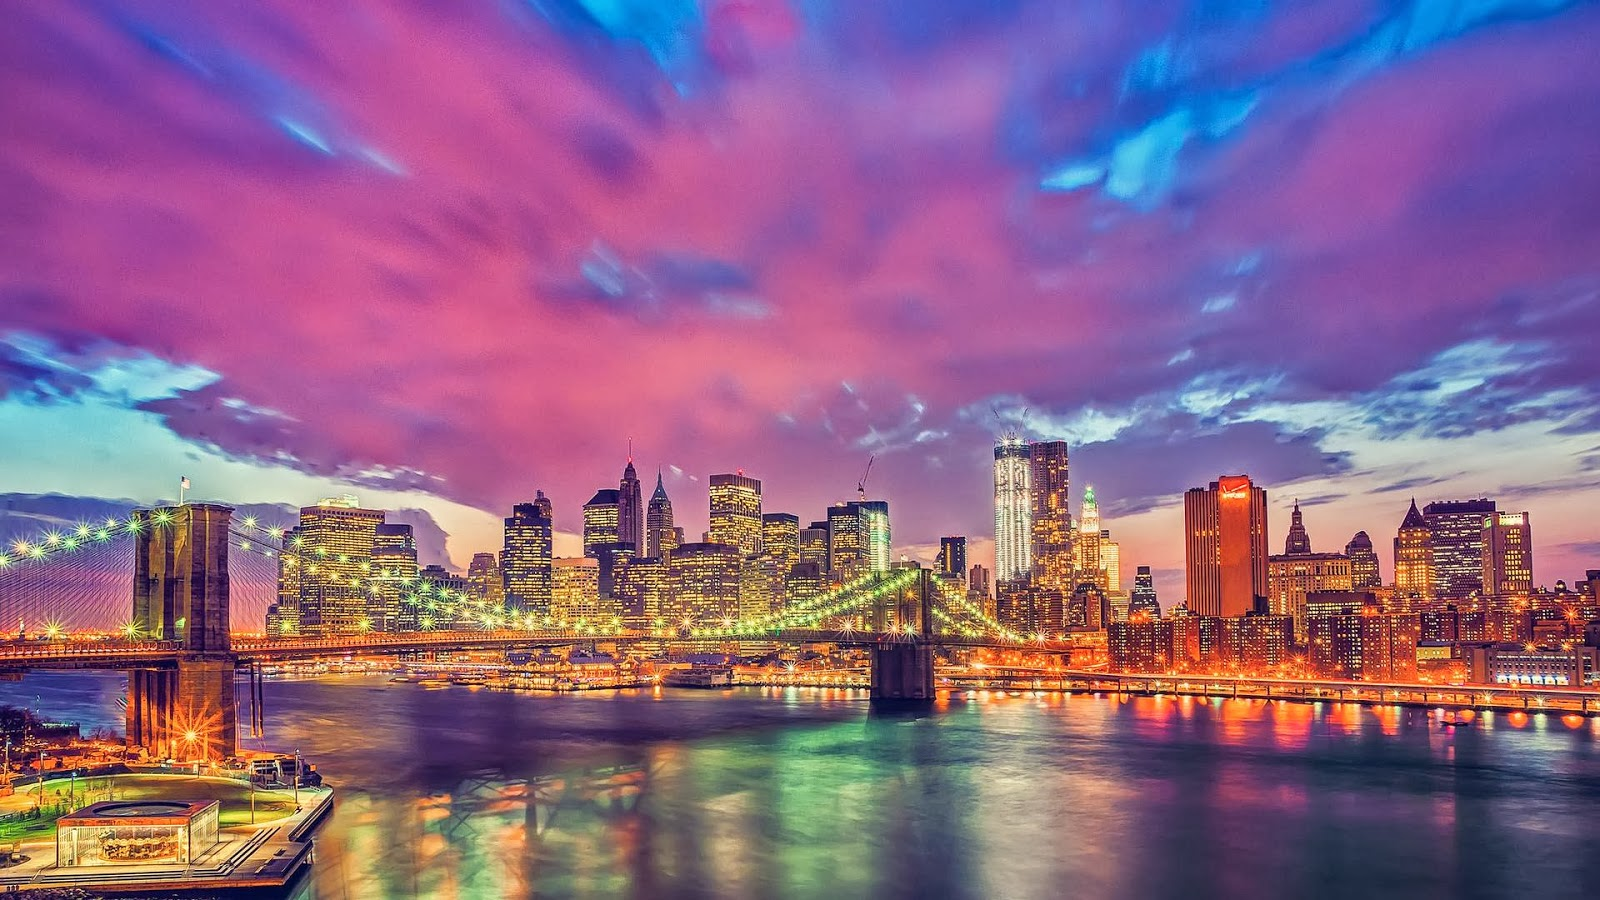 Desktop hd wallpapers free downloads beautiful bridges in - Bridge wallpaper hd ...